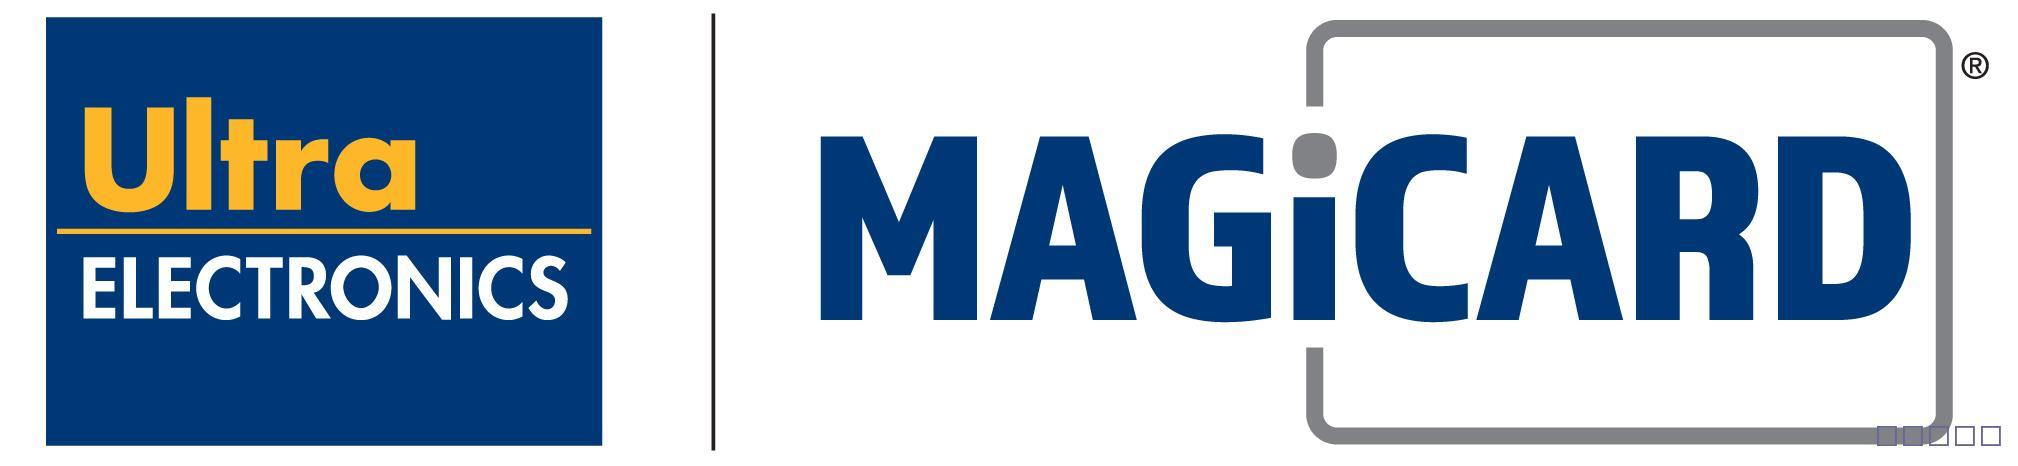 http://www.magicard.com